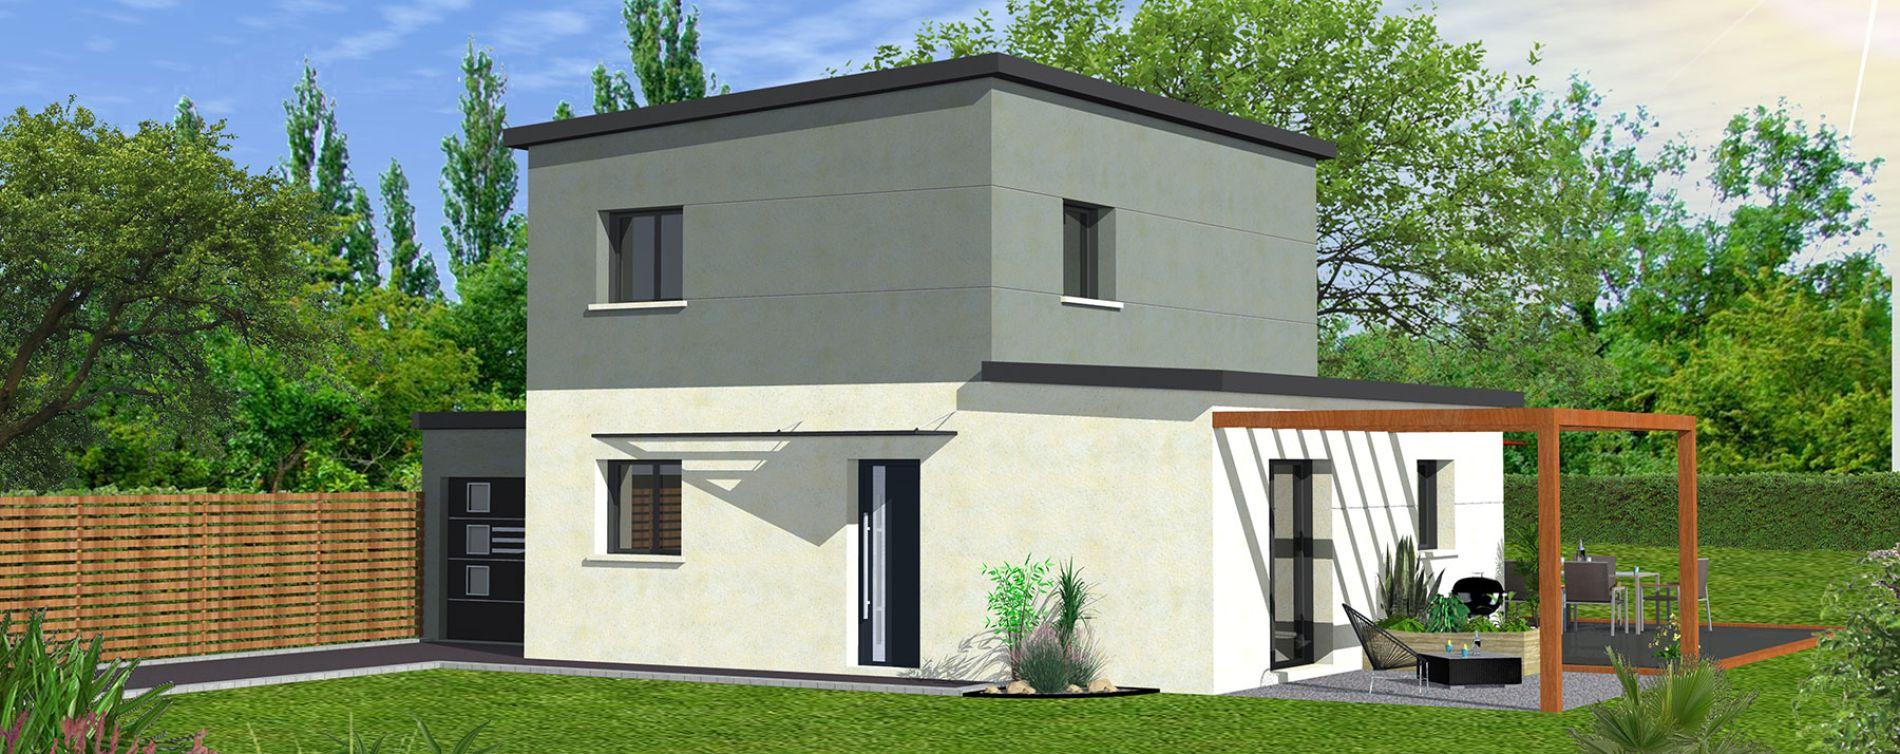 Brest : programme immobilier neuve « Le Chemin du Vallon » (3)